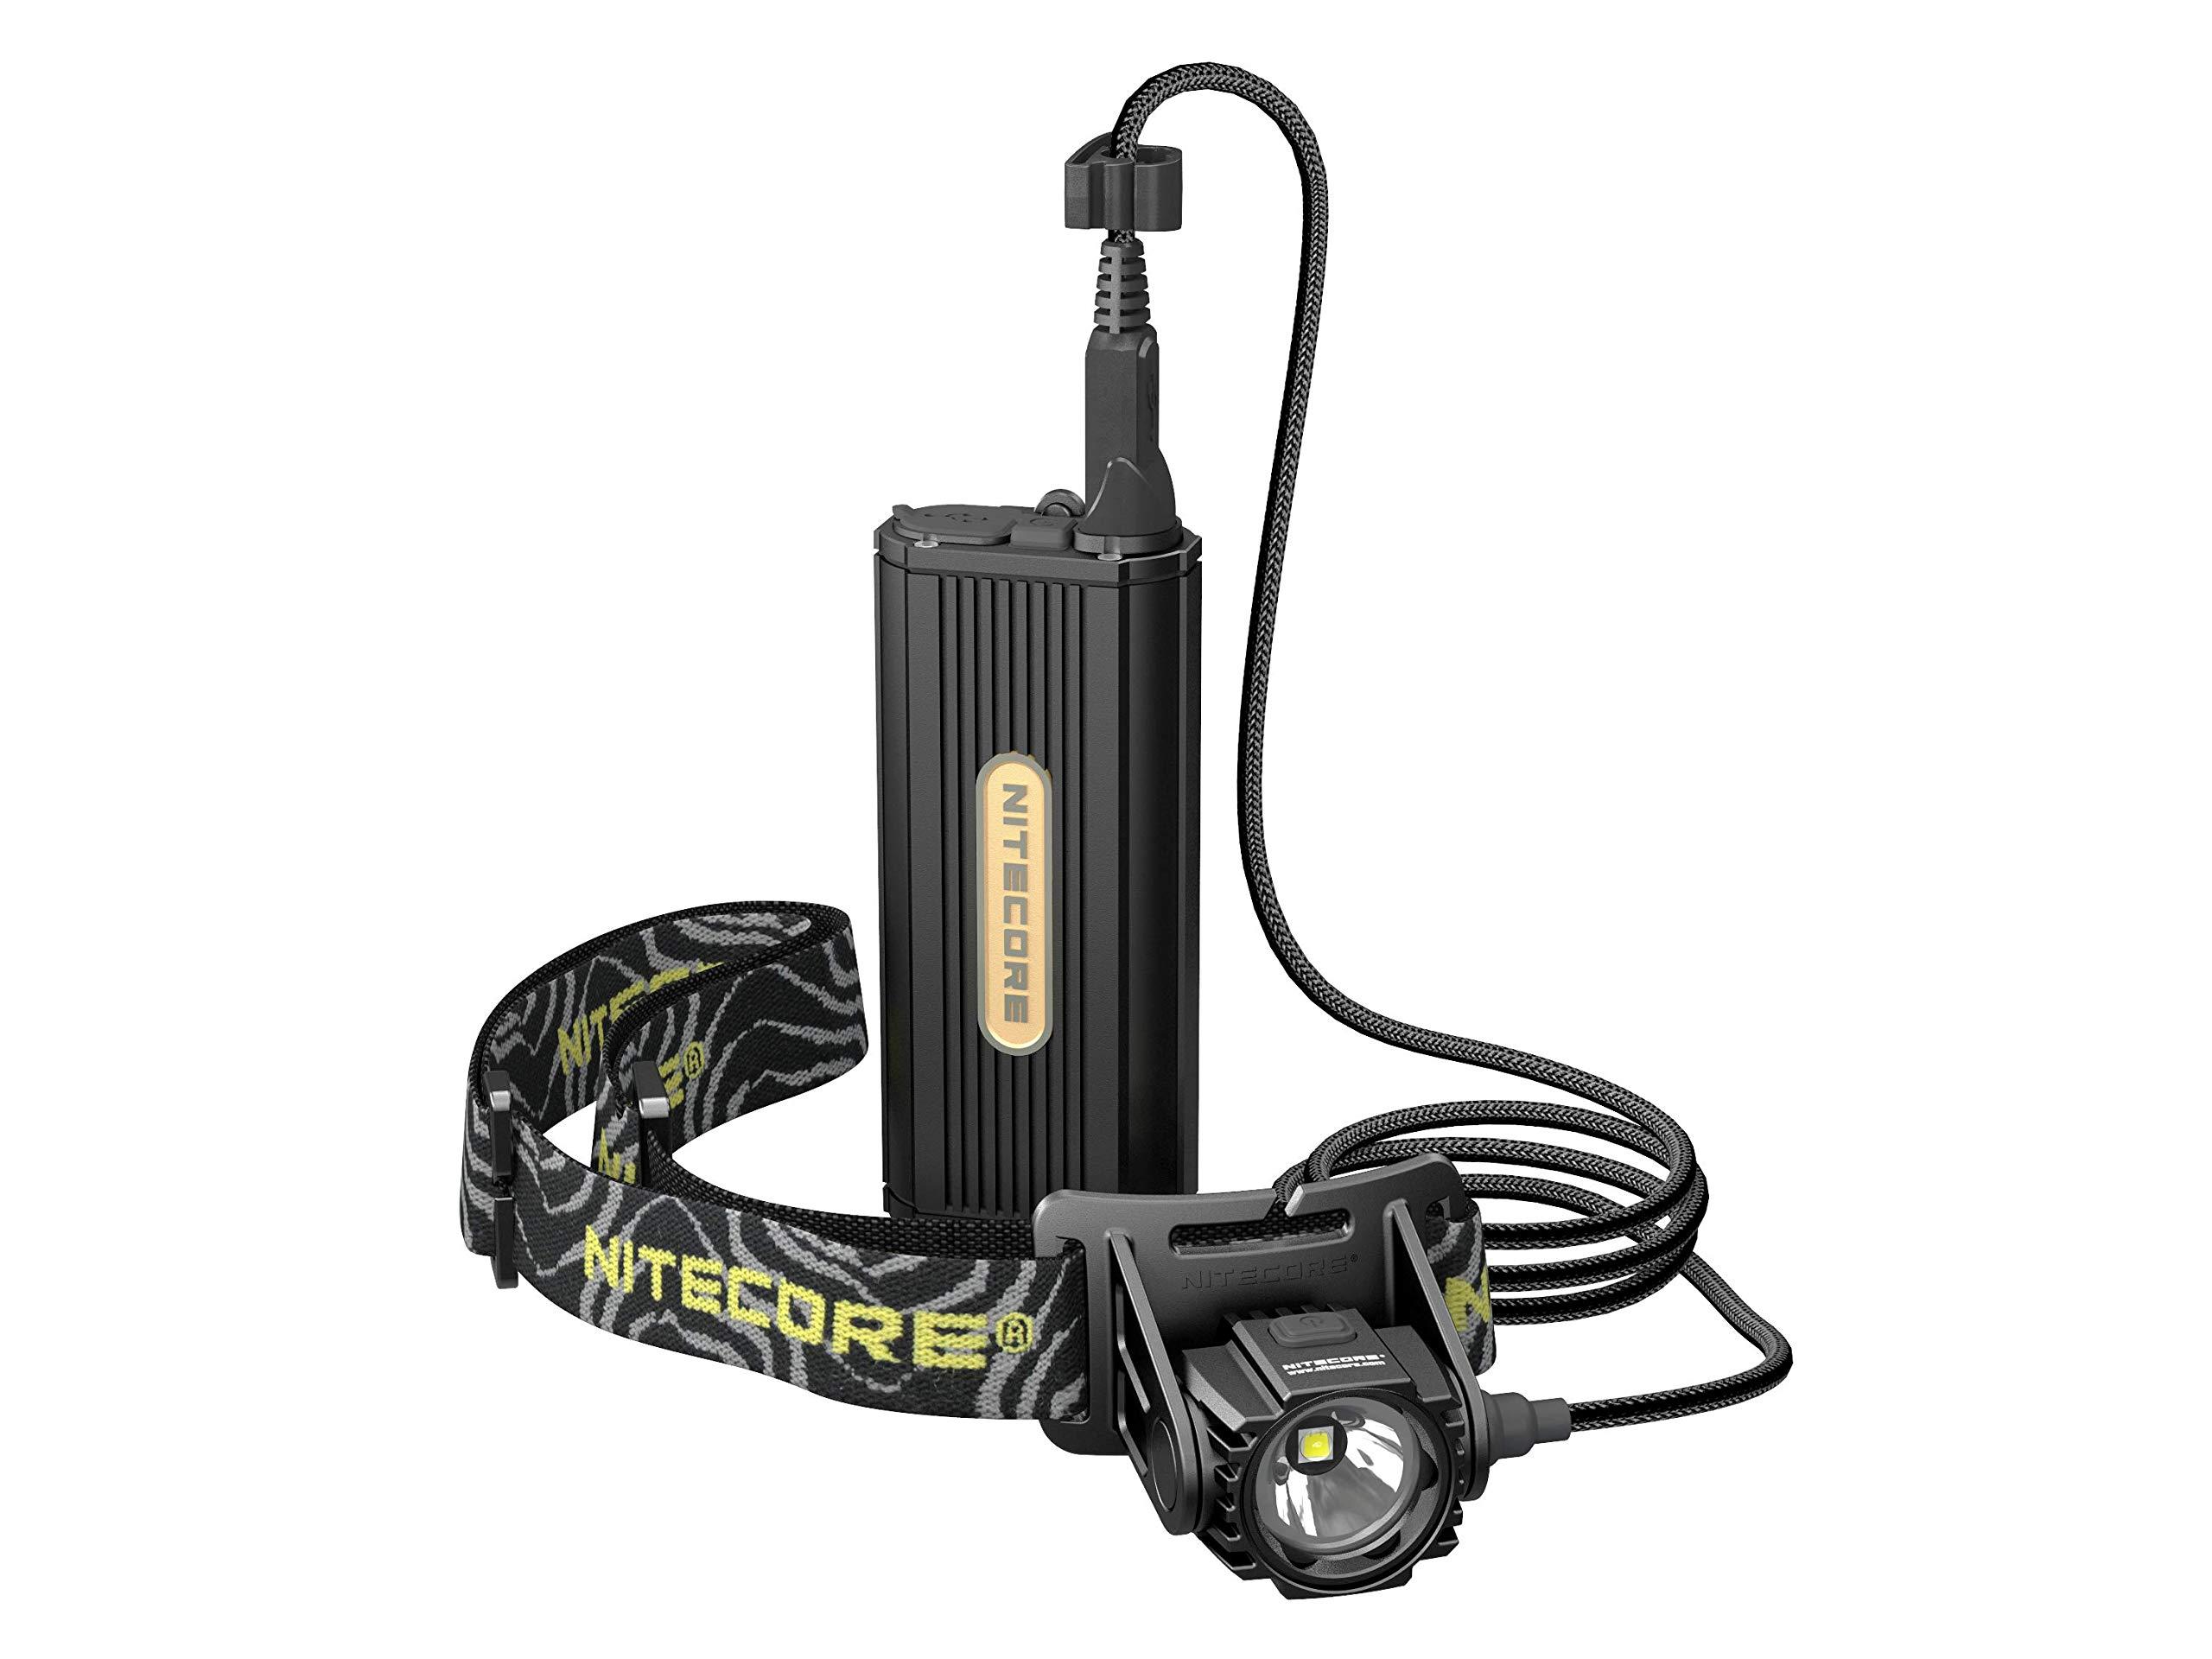 Linternas : Nitecore Hc70 1000 Lumen C/ Battery Pack Ext